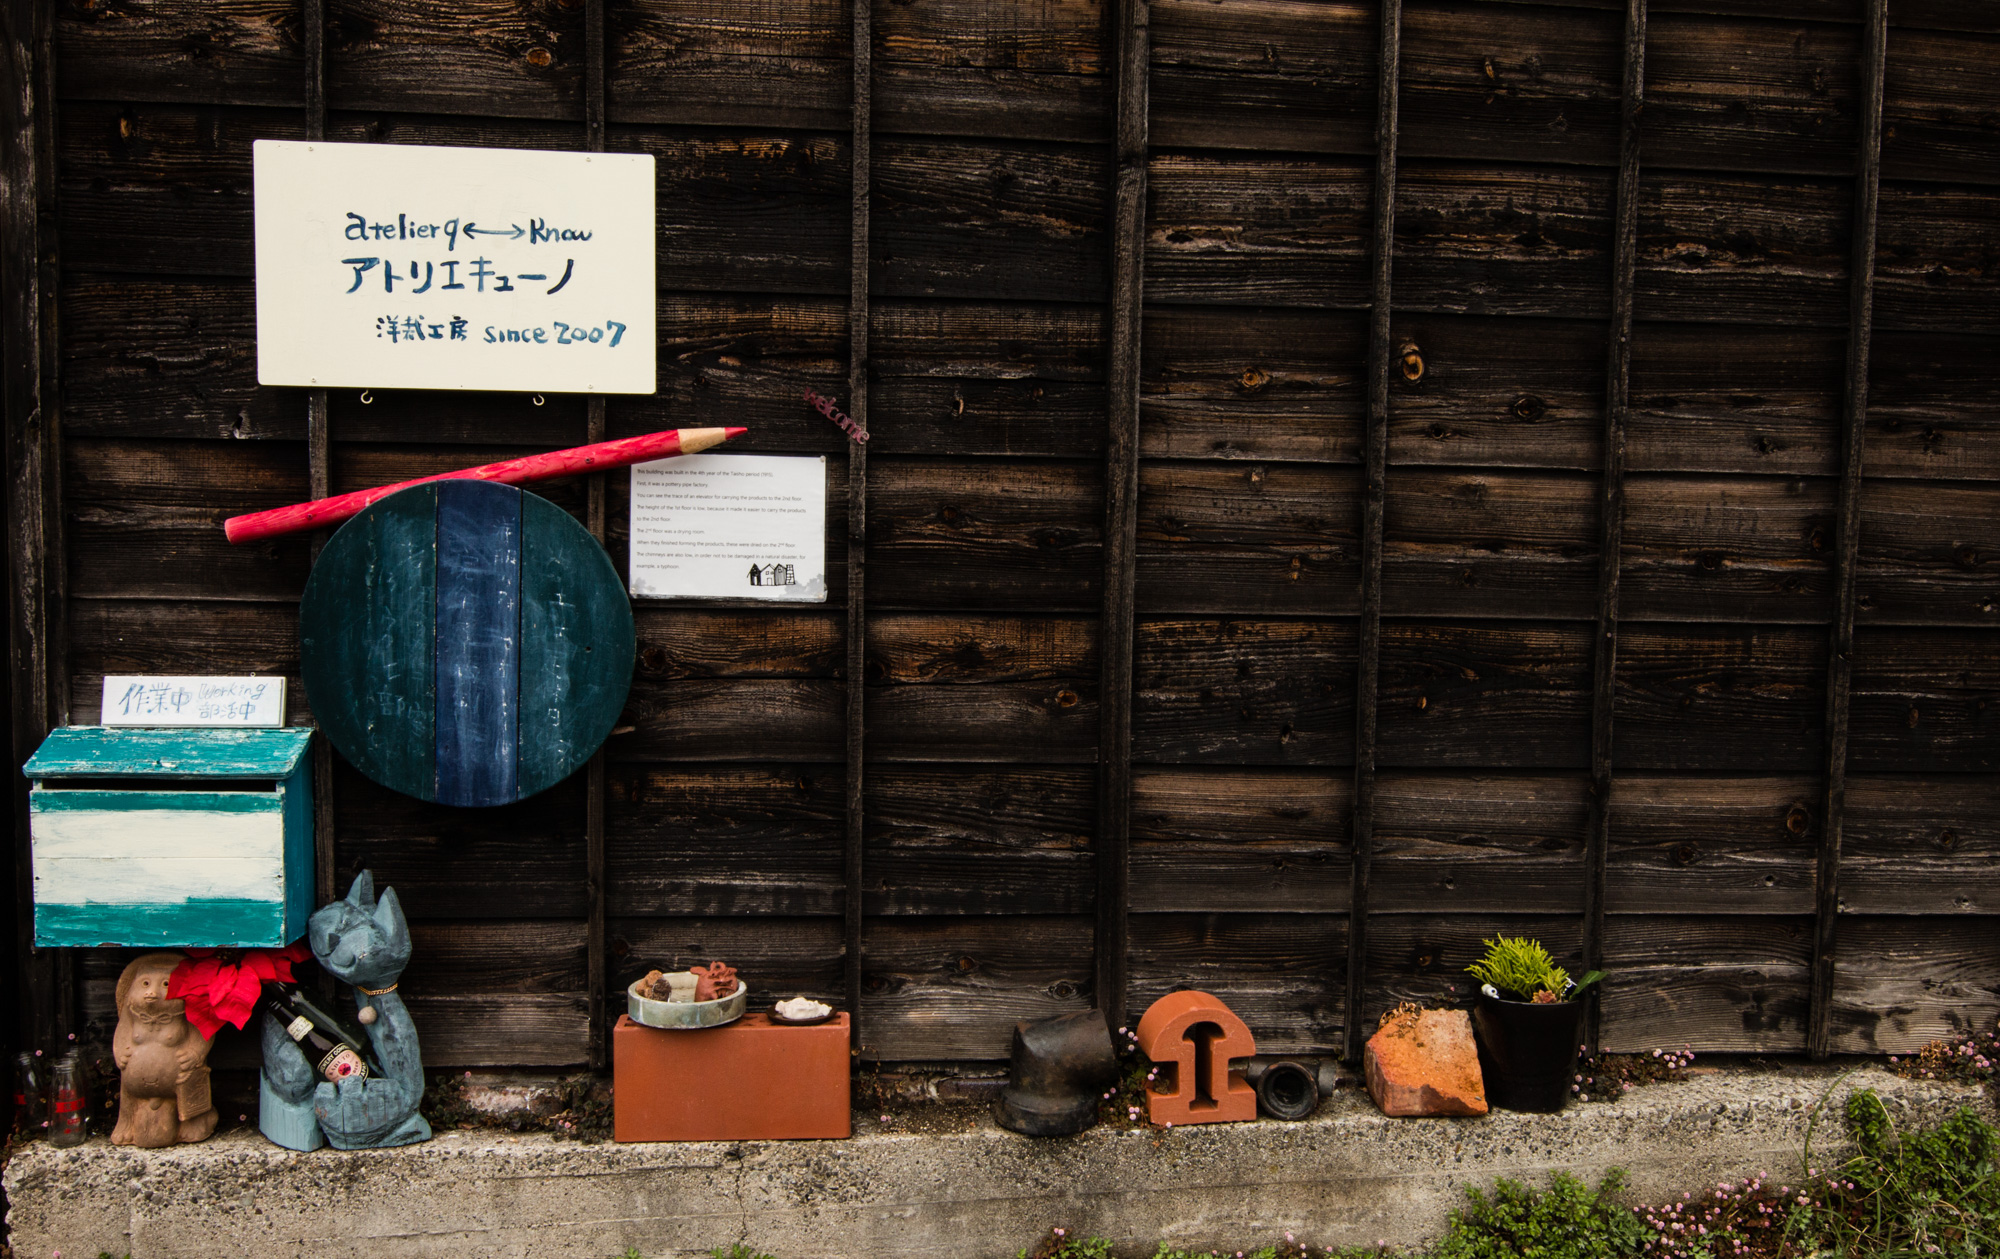 Tokoname, Japan